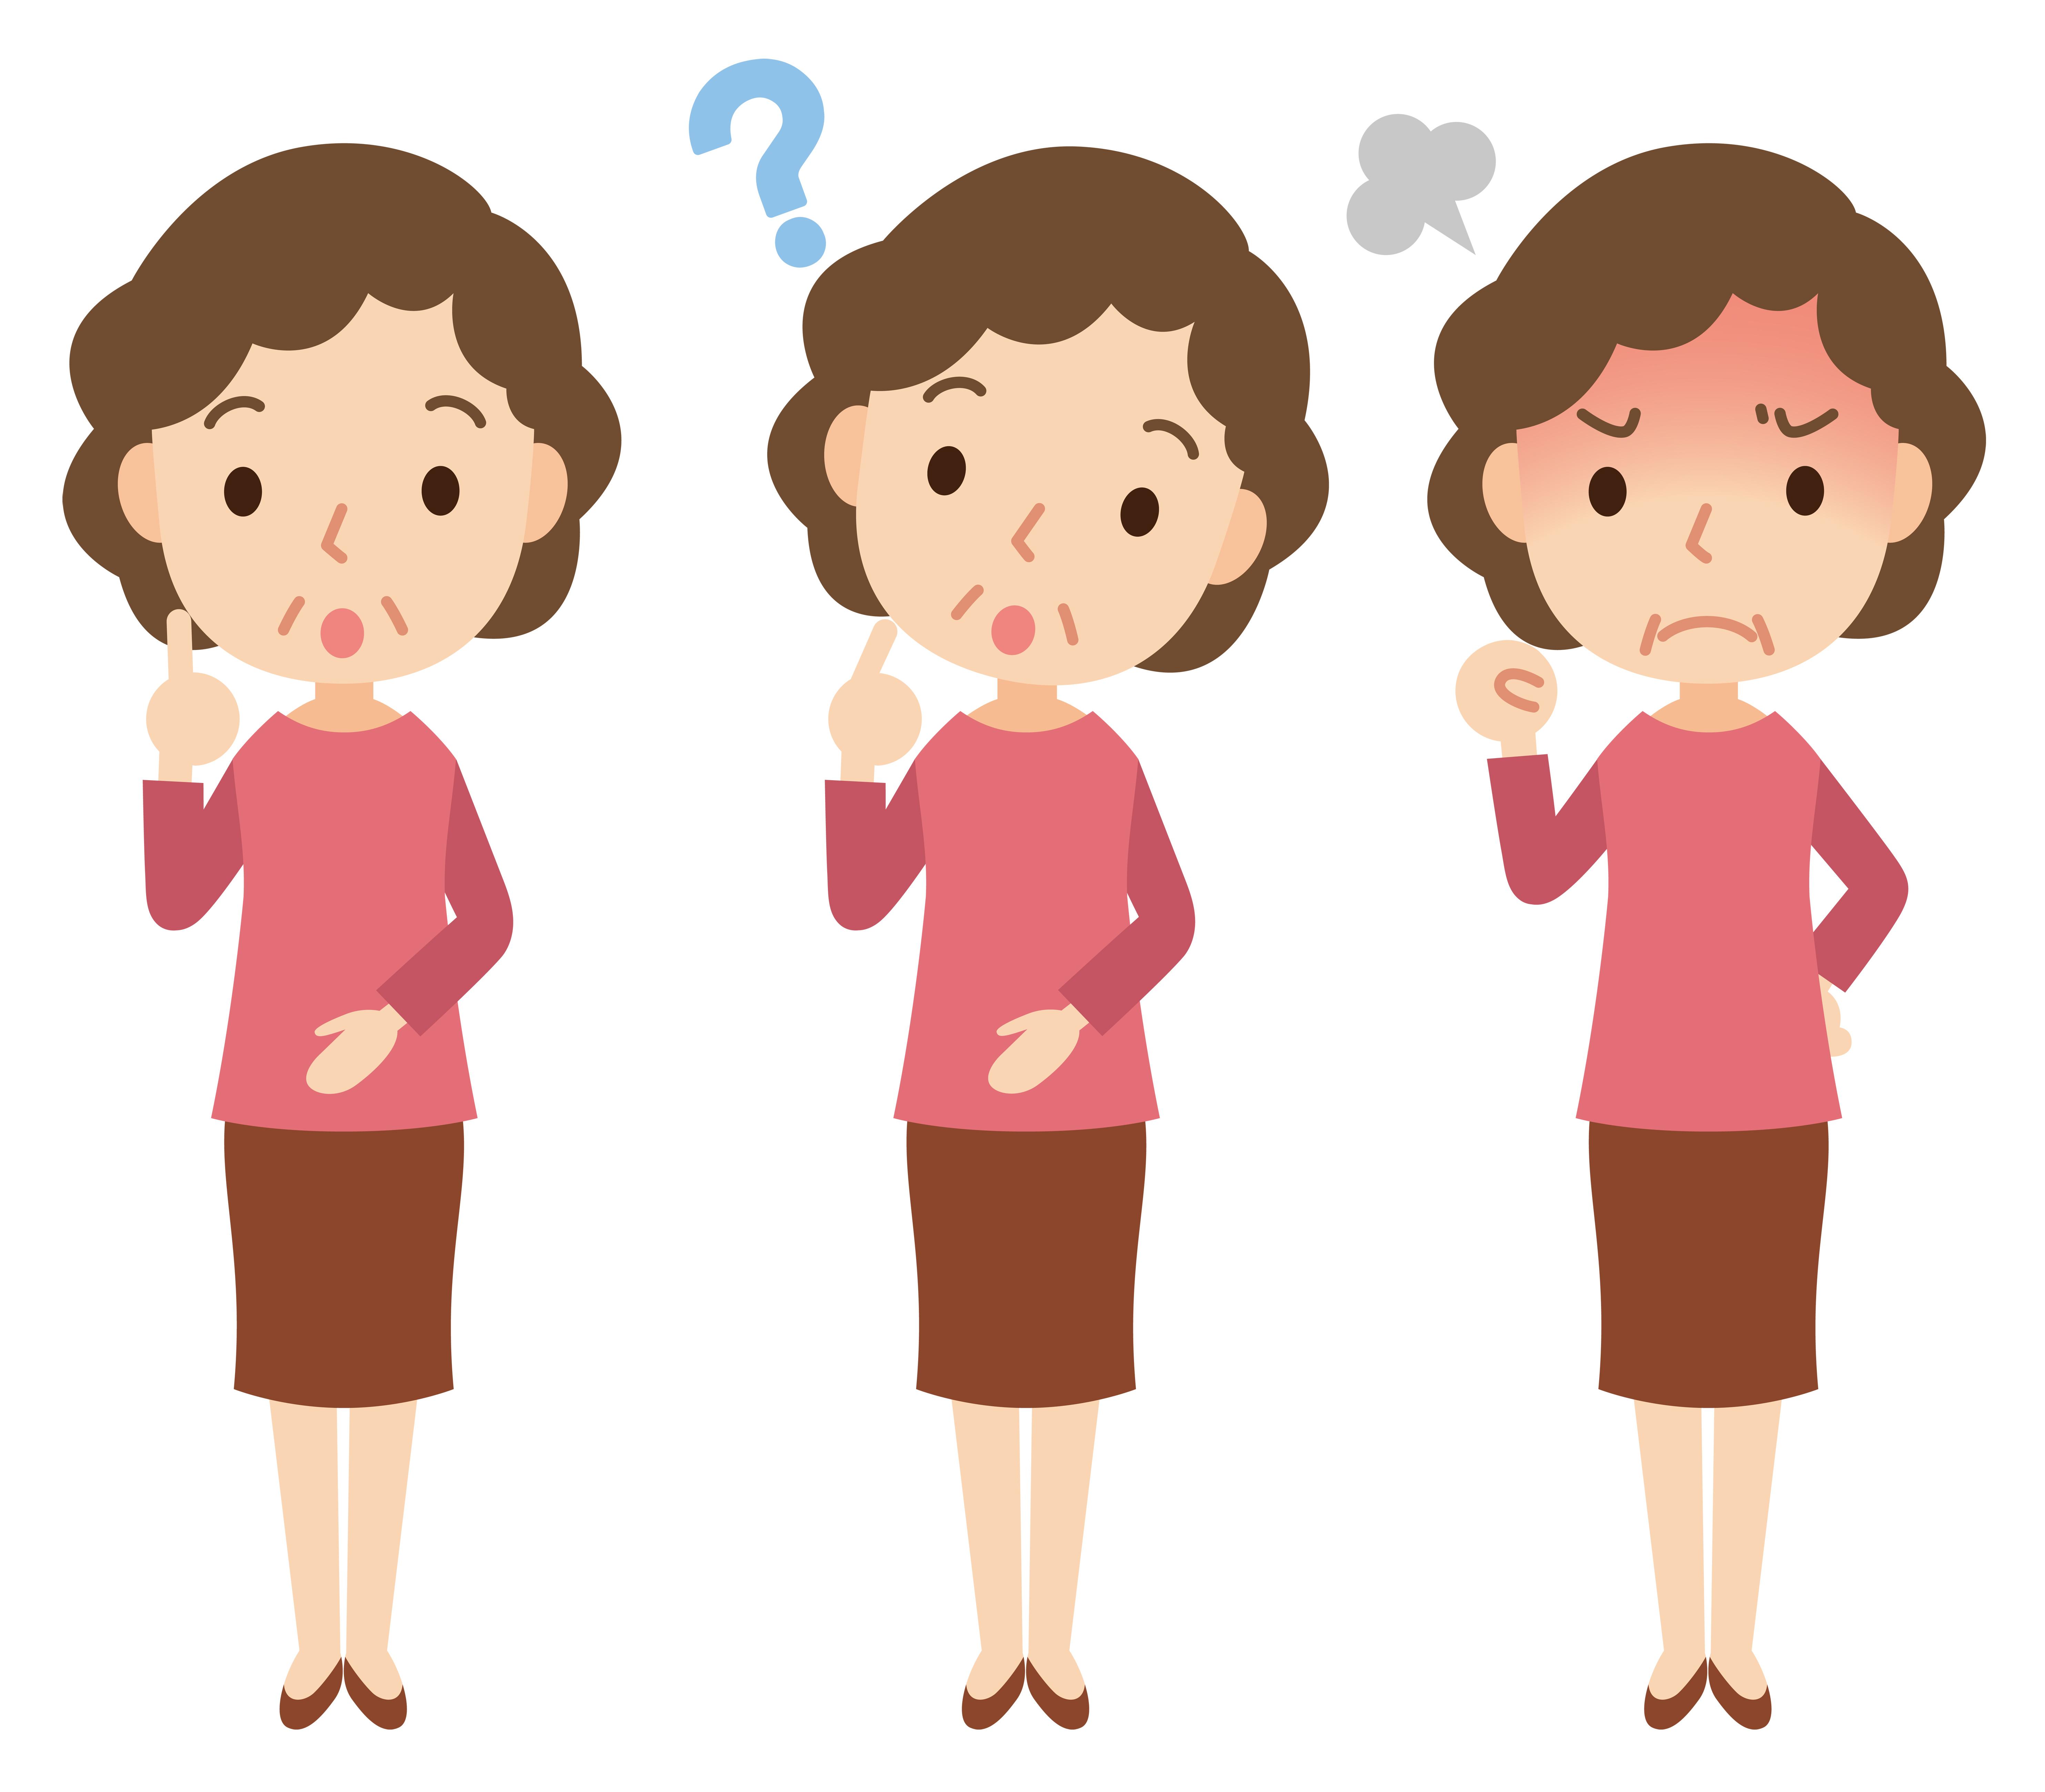 De cand am intrat la menopauza, m-am ingrasat. Exista vreo legatura? | keracalita-jaristea.ro